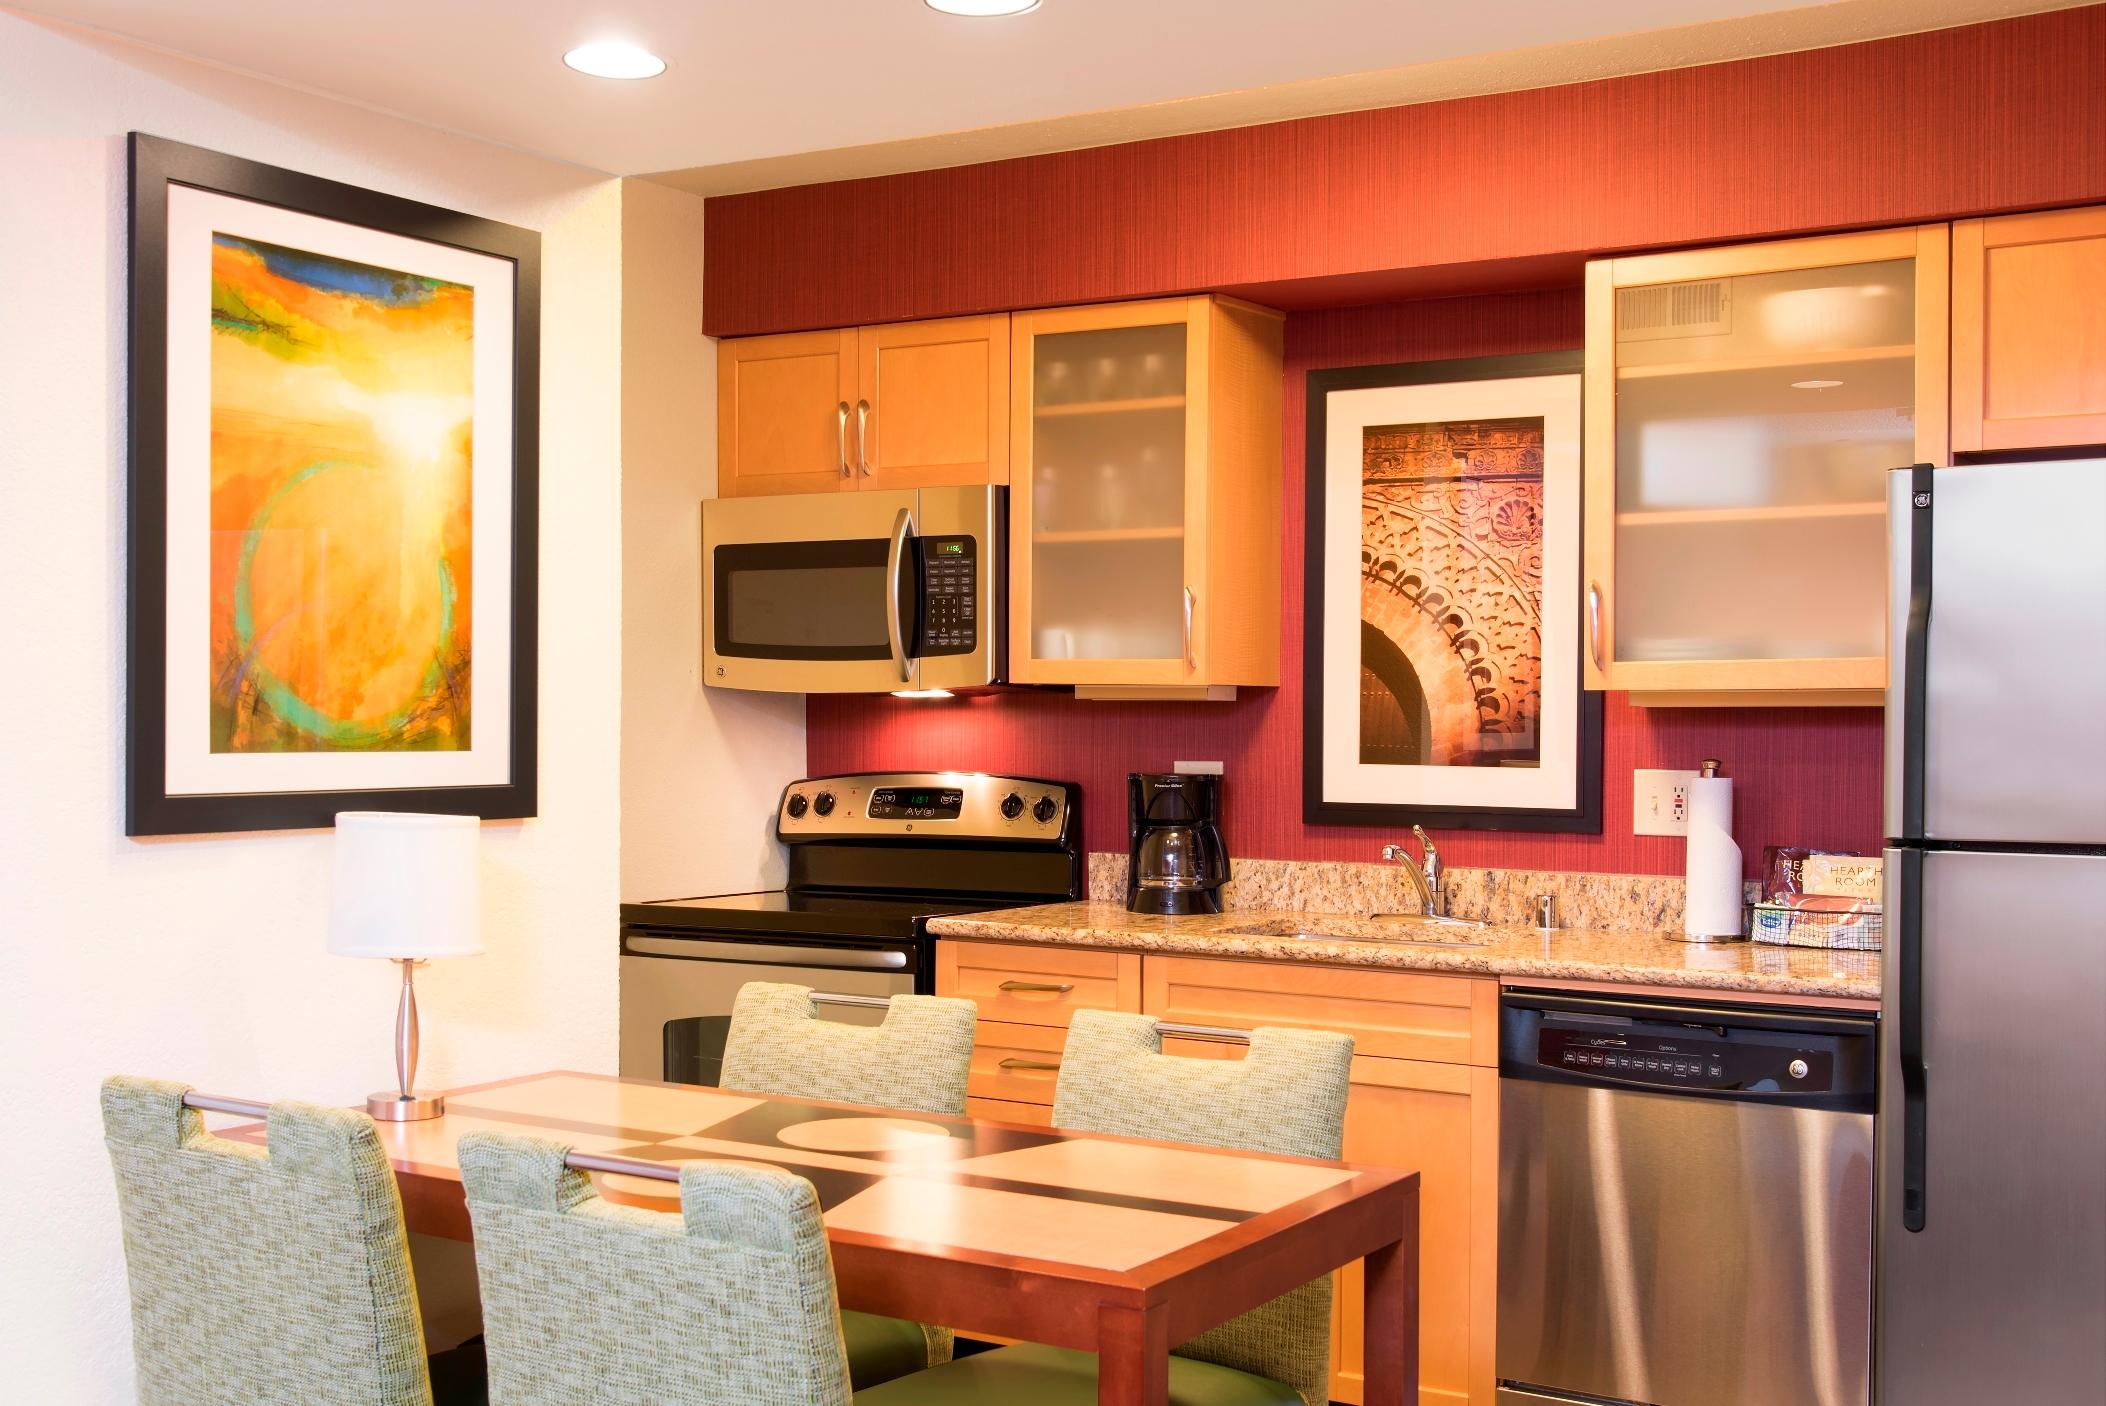 Residence Inn by Marriott Chicago Deerfield image 3